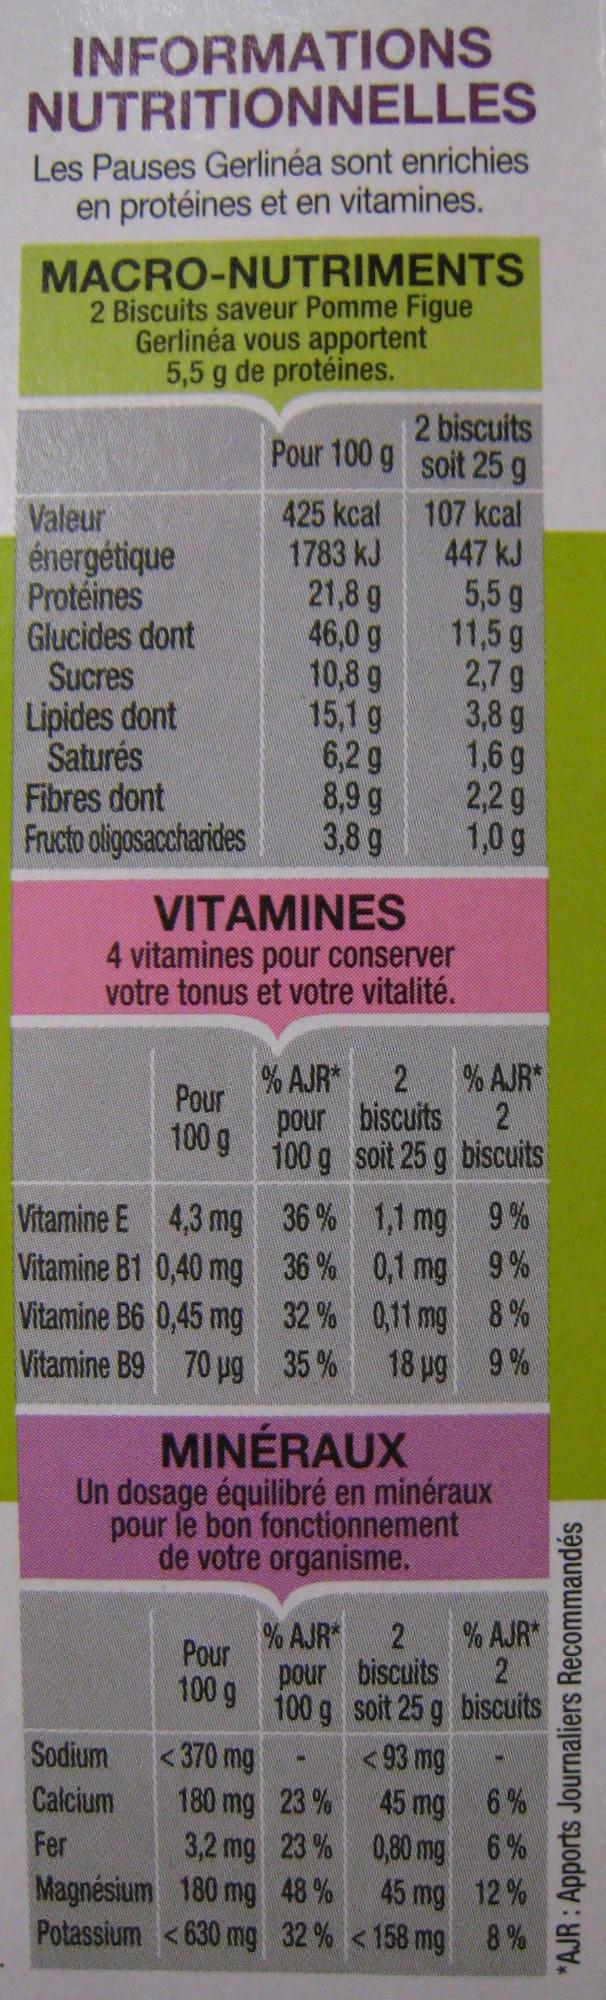 Biscuits saveur pomme figue - Informations nutritionnelles